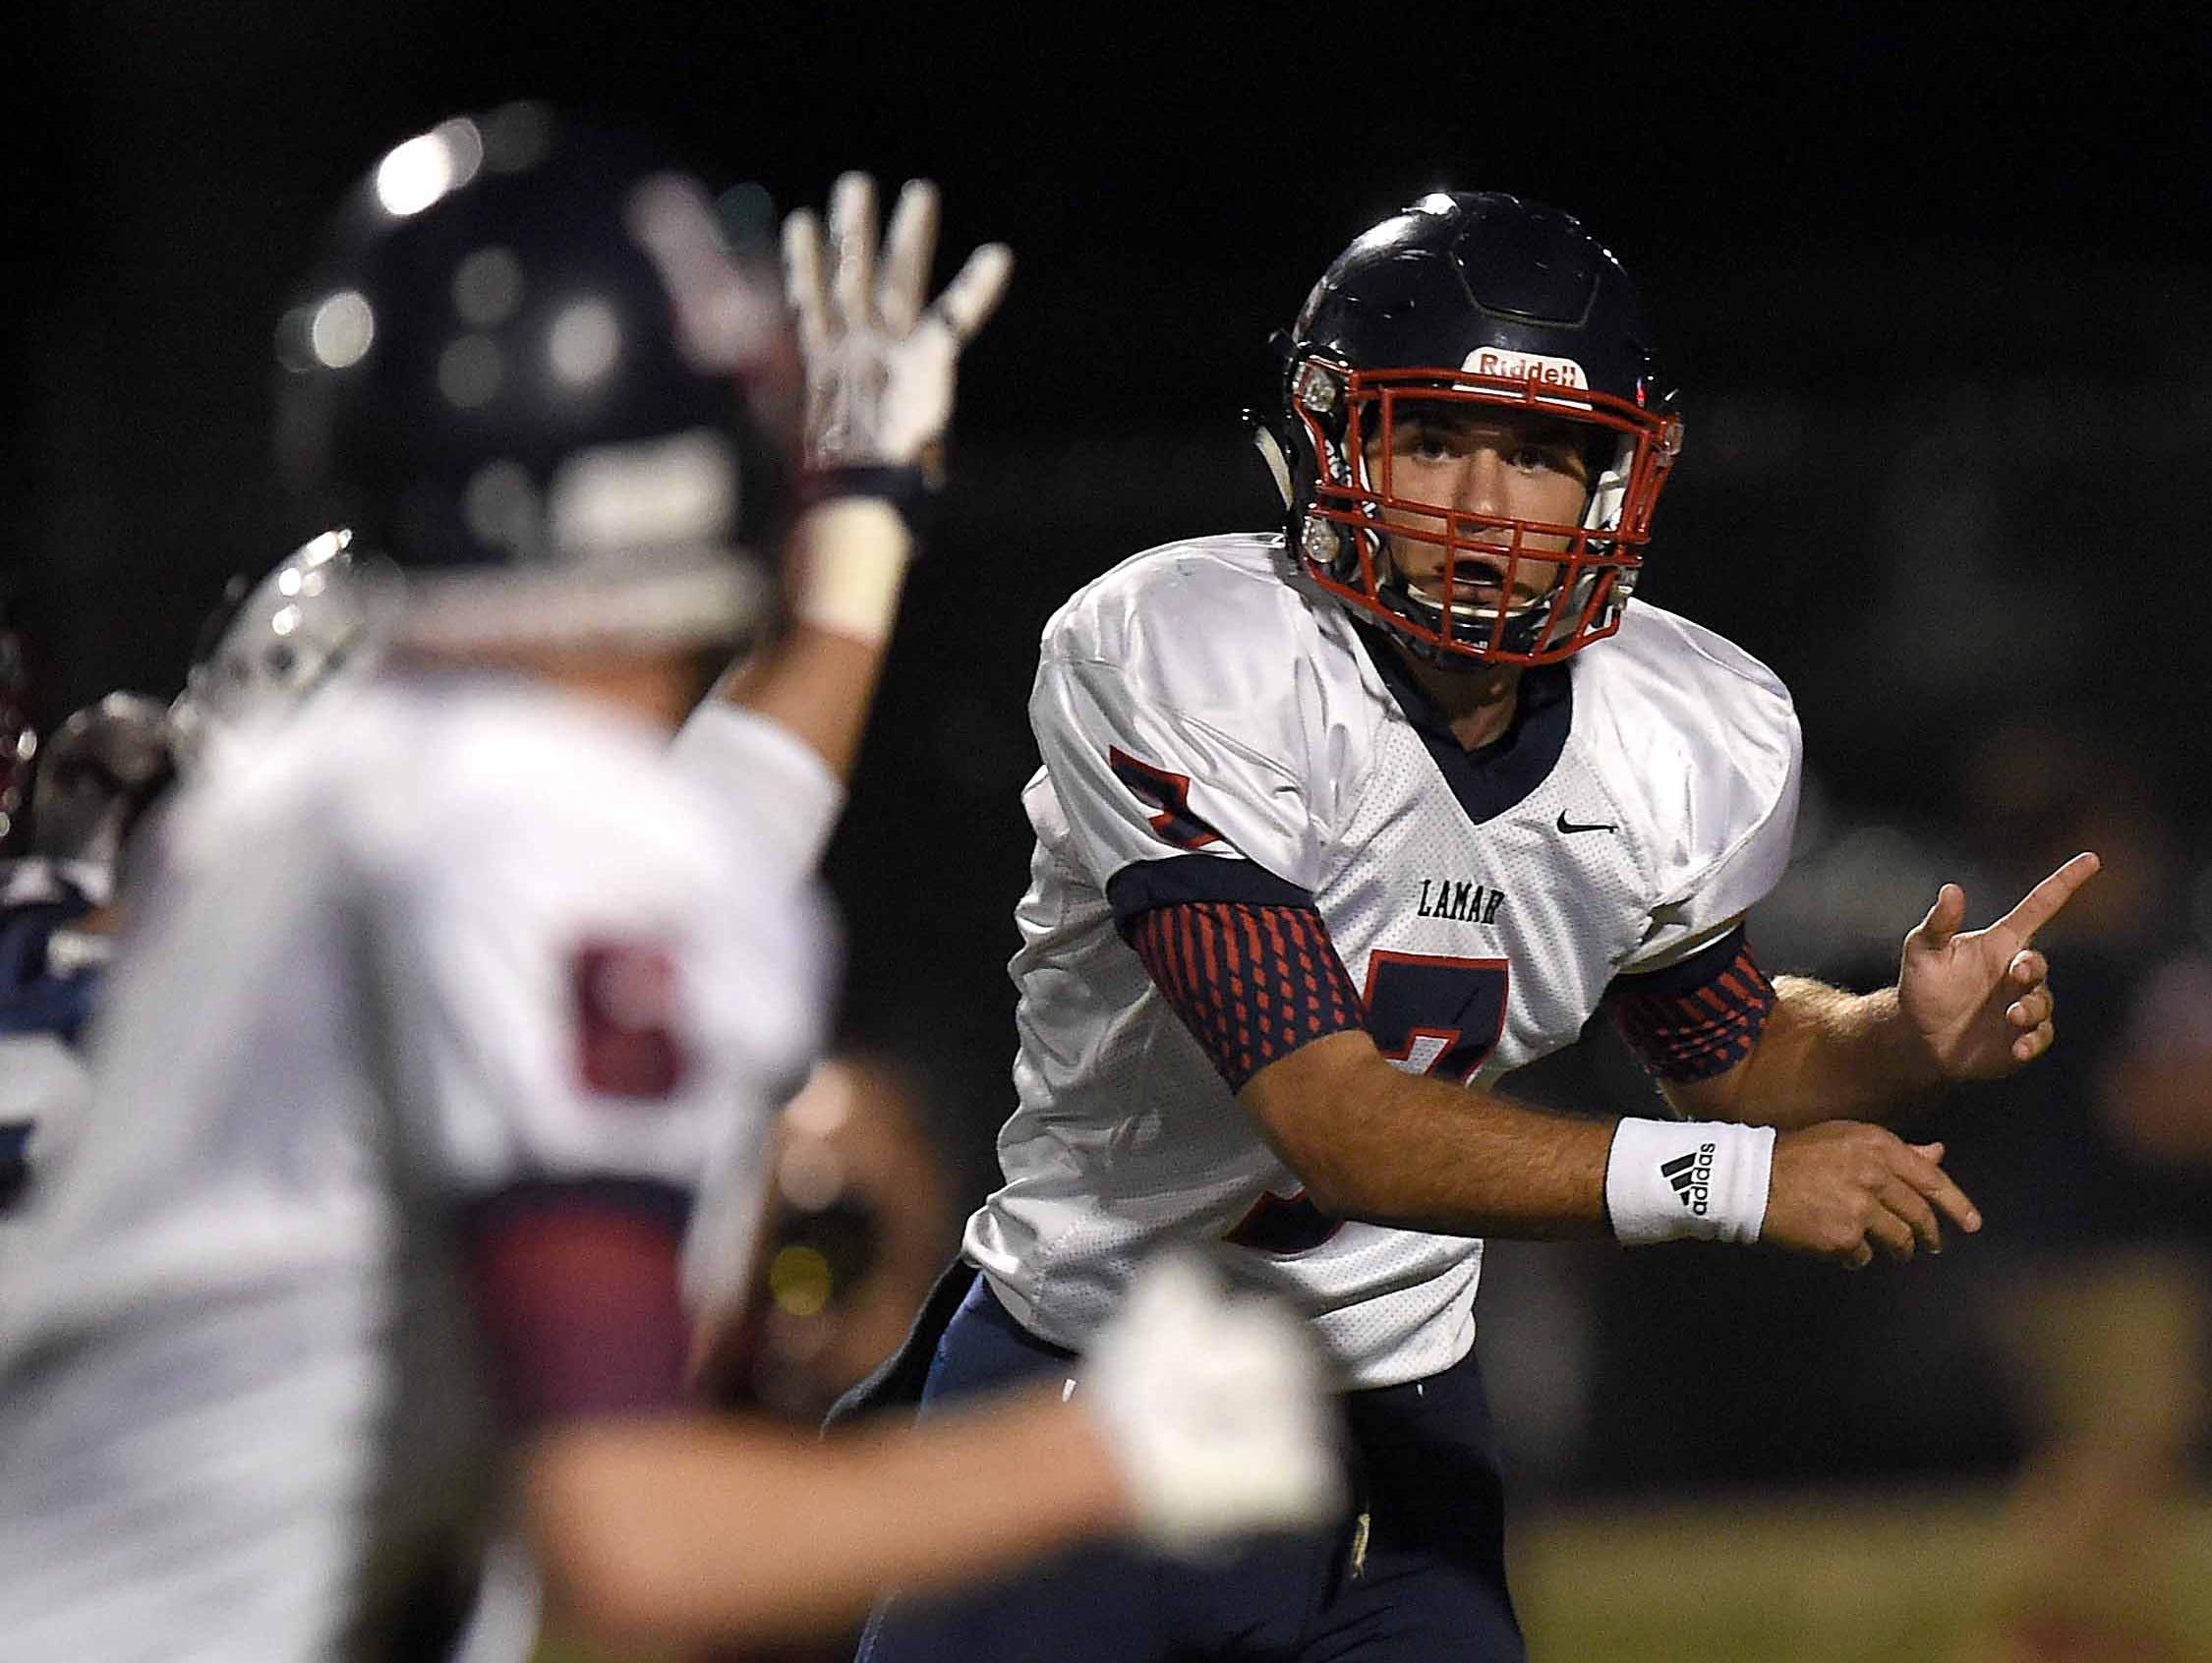 Lamar quarterback Davis Harrison passes to Clay Truelove (5) on Friday, October 30, 2015, at Madison-Ridgeland Academy in Madison, Miss.